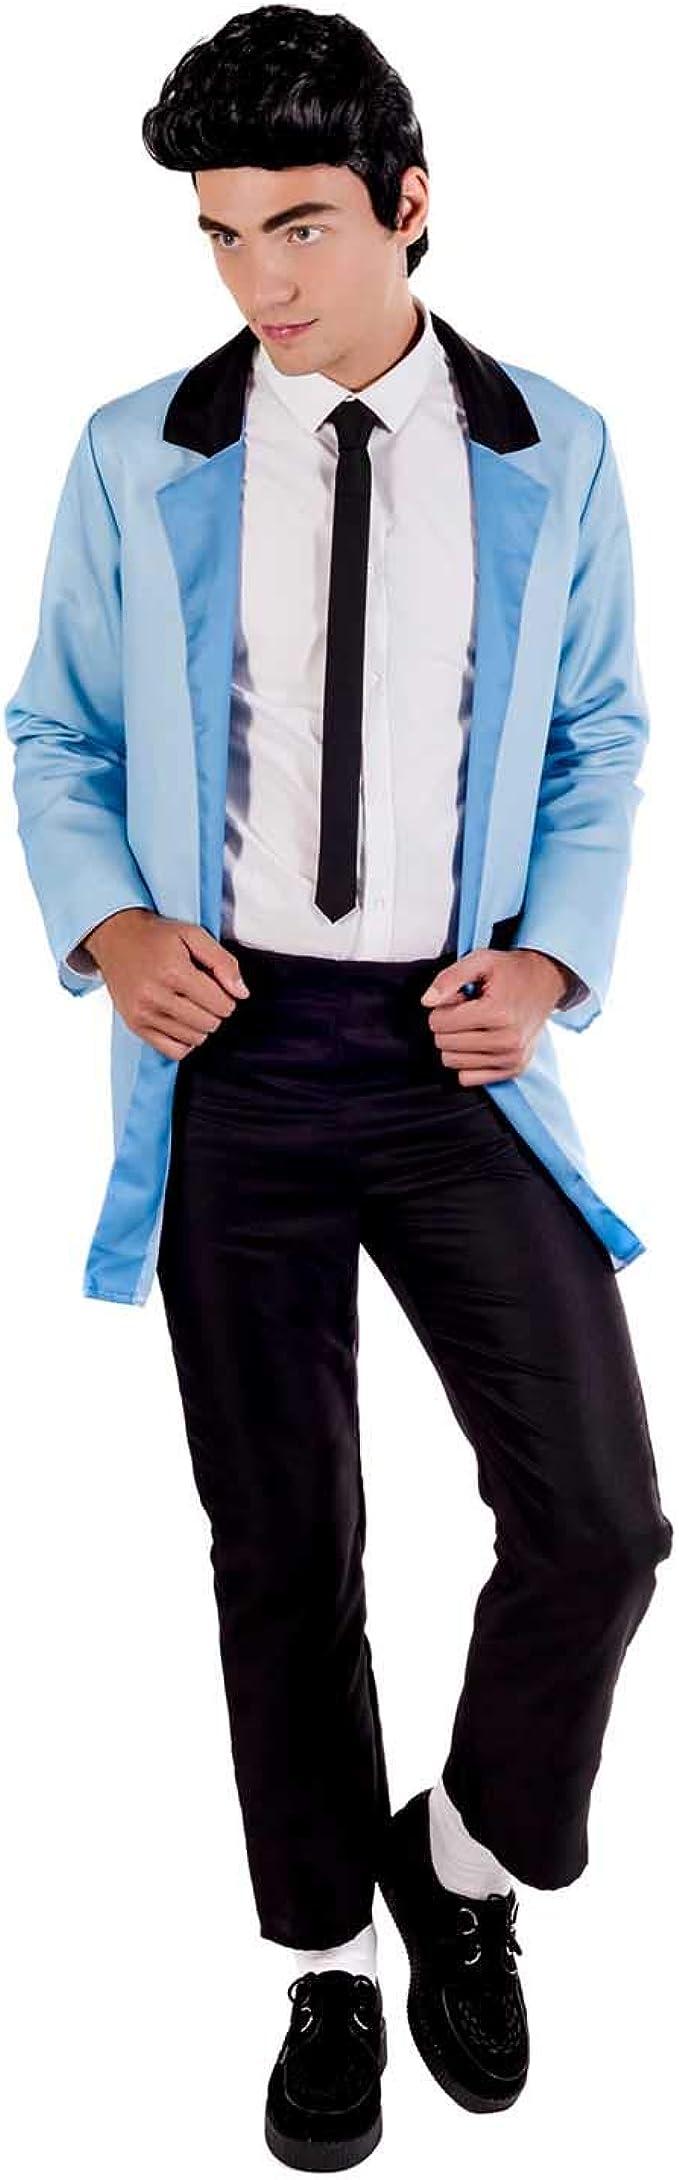 MENS TEDDY BOY 1950S BLACK WIG /& CHIC GLASSES FANCY DRESS COSTUME